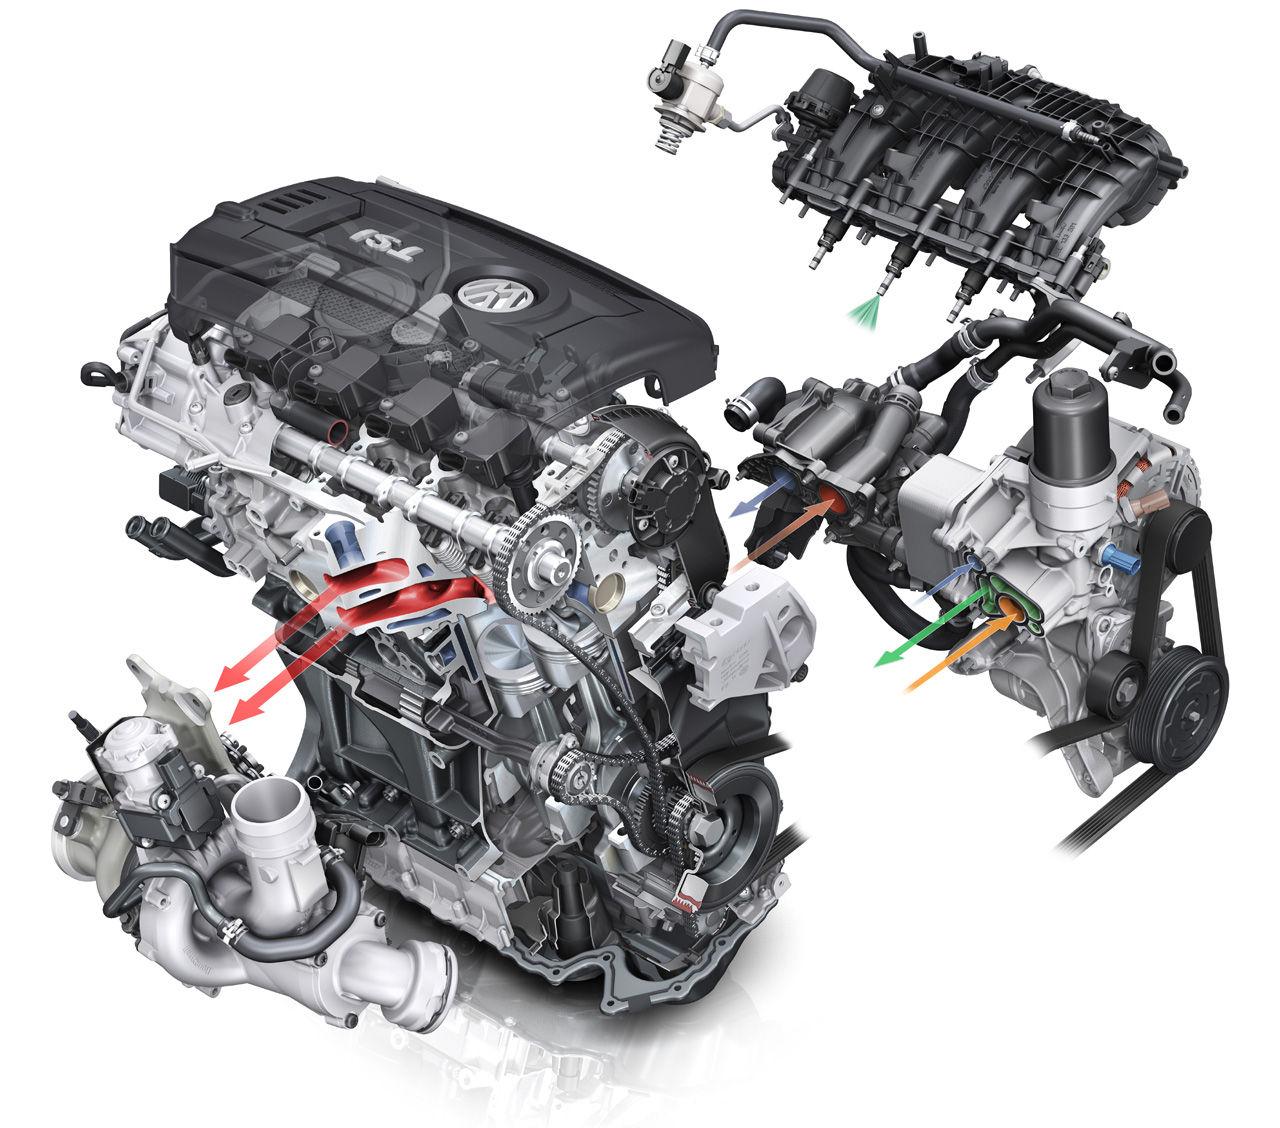 2 0 tsi engine diagram on vw 2 0 tsi engine diagram vw golf 96 cooling diagram 2 0 wiring 97 2.0 VW Engine 2.0 TSI Jetta Engine Bay